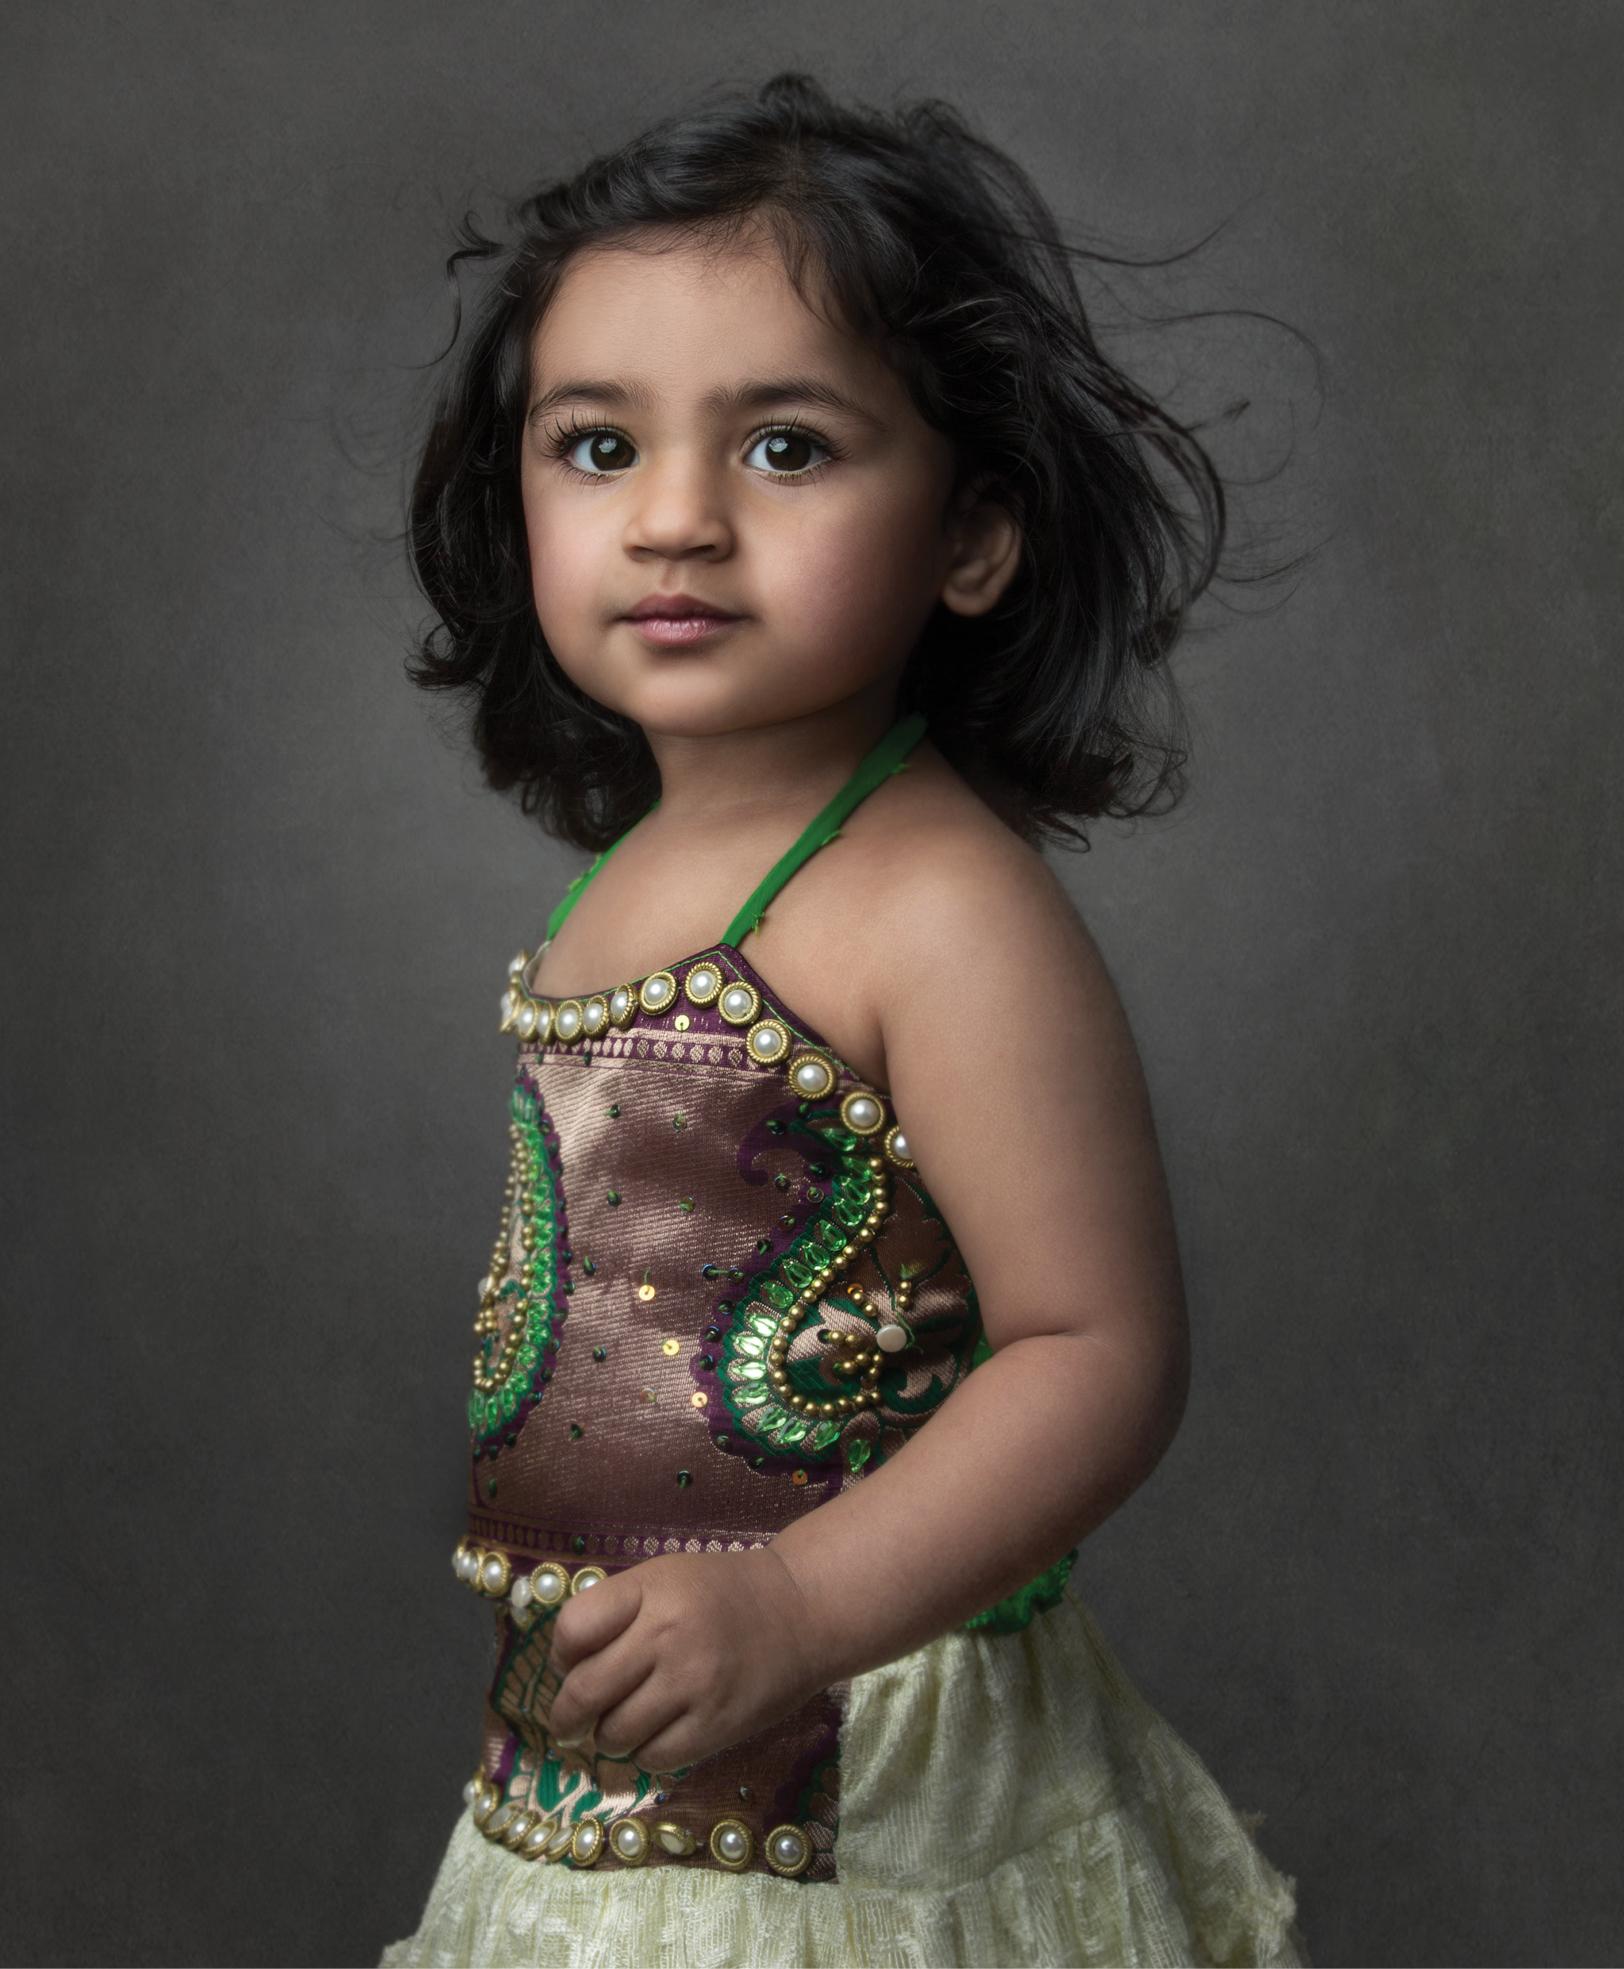 FIne-Art-Child-Portraits-4.jpg